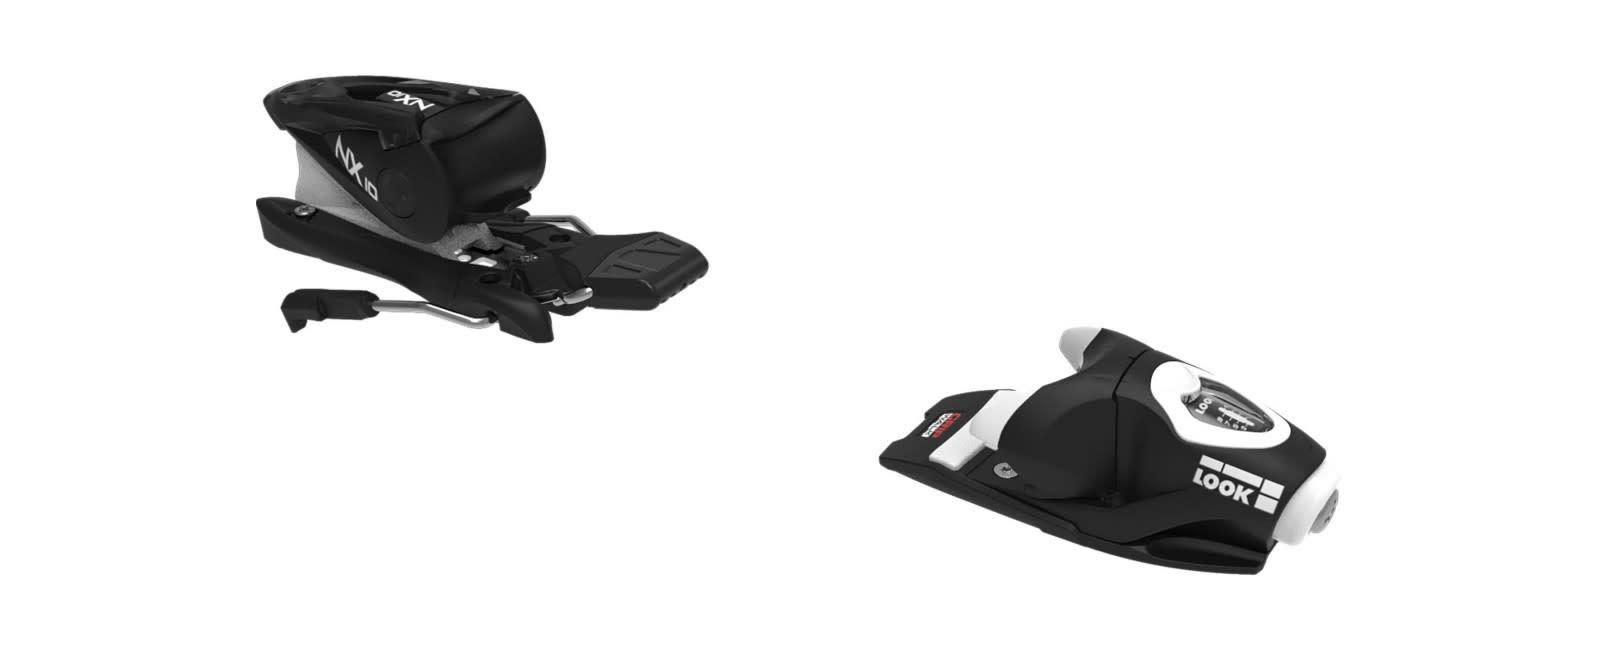 LOOK Look NX 10 GW Ski Binding (2021)